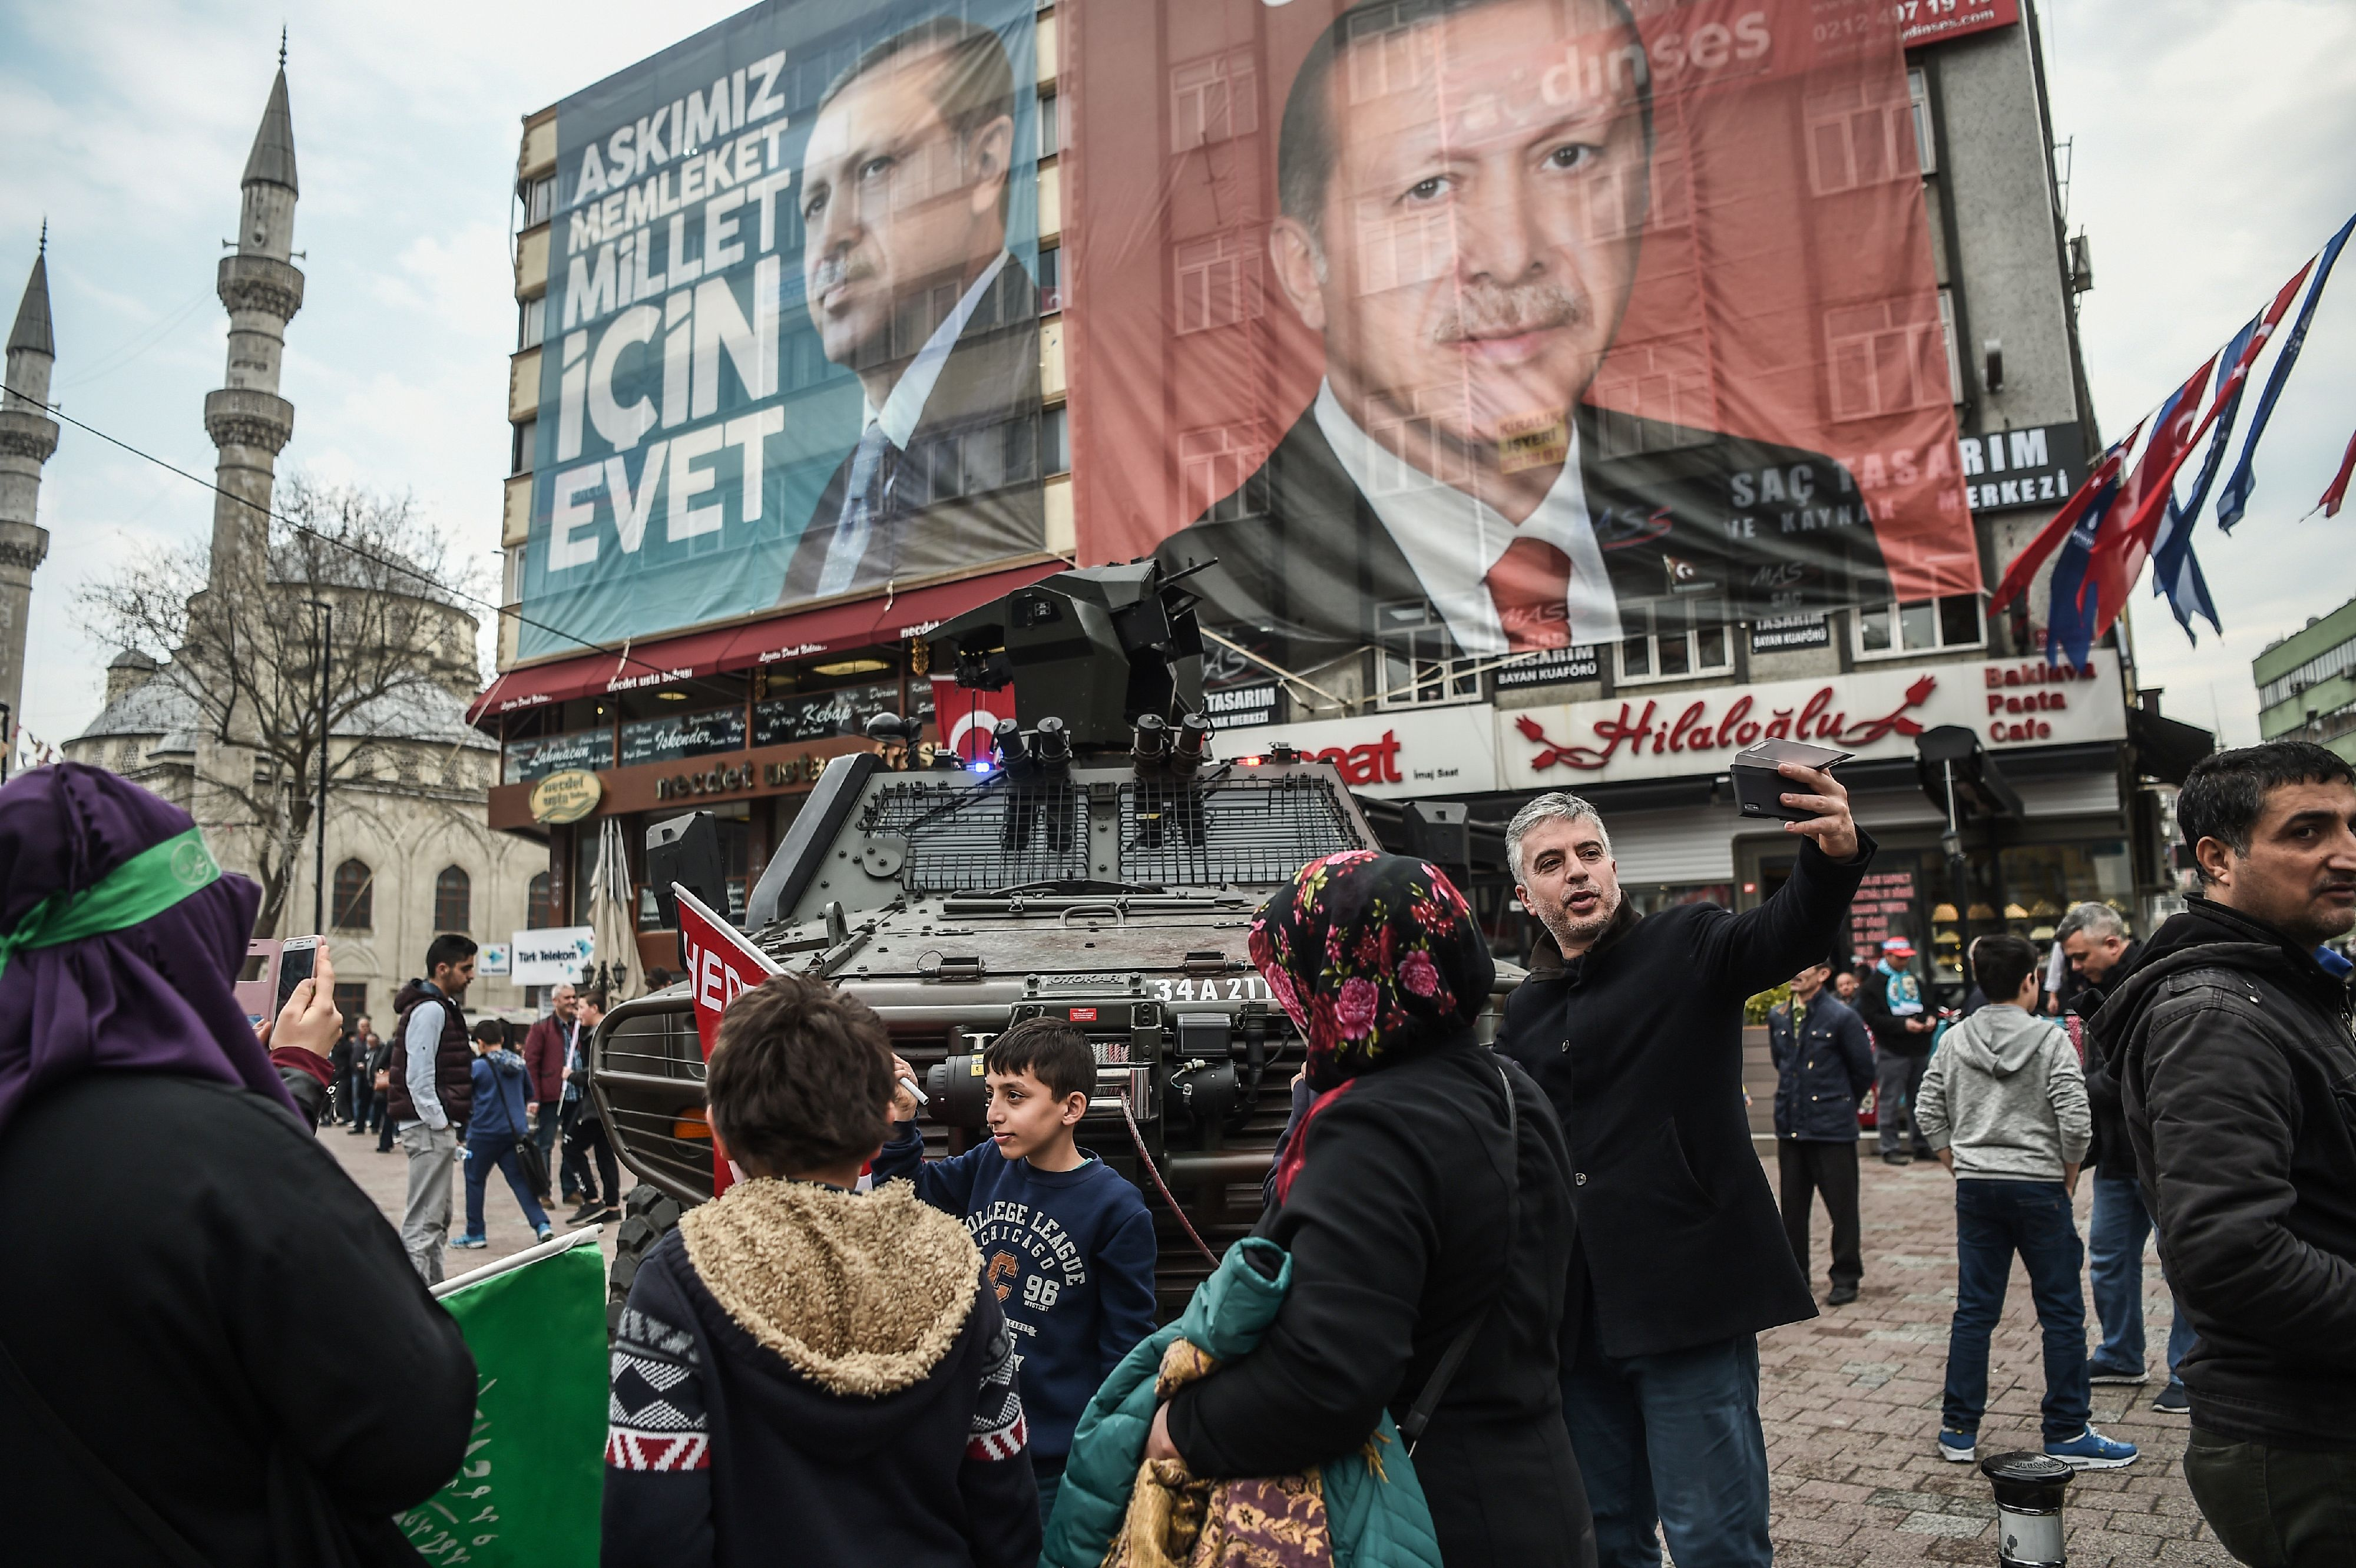 مظاهرات مؤيدة لأردوغان